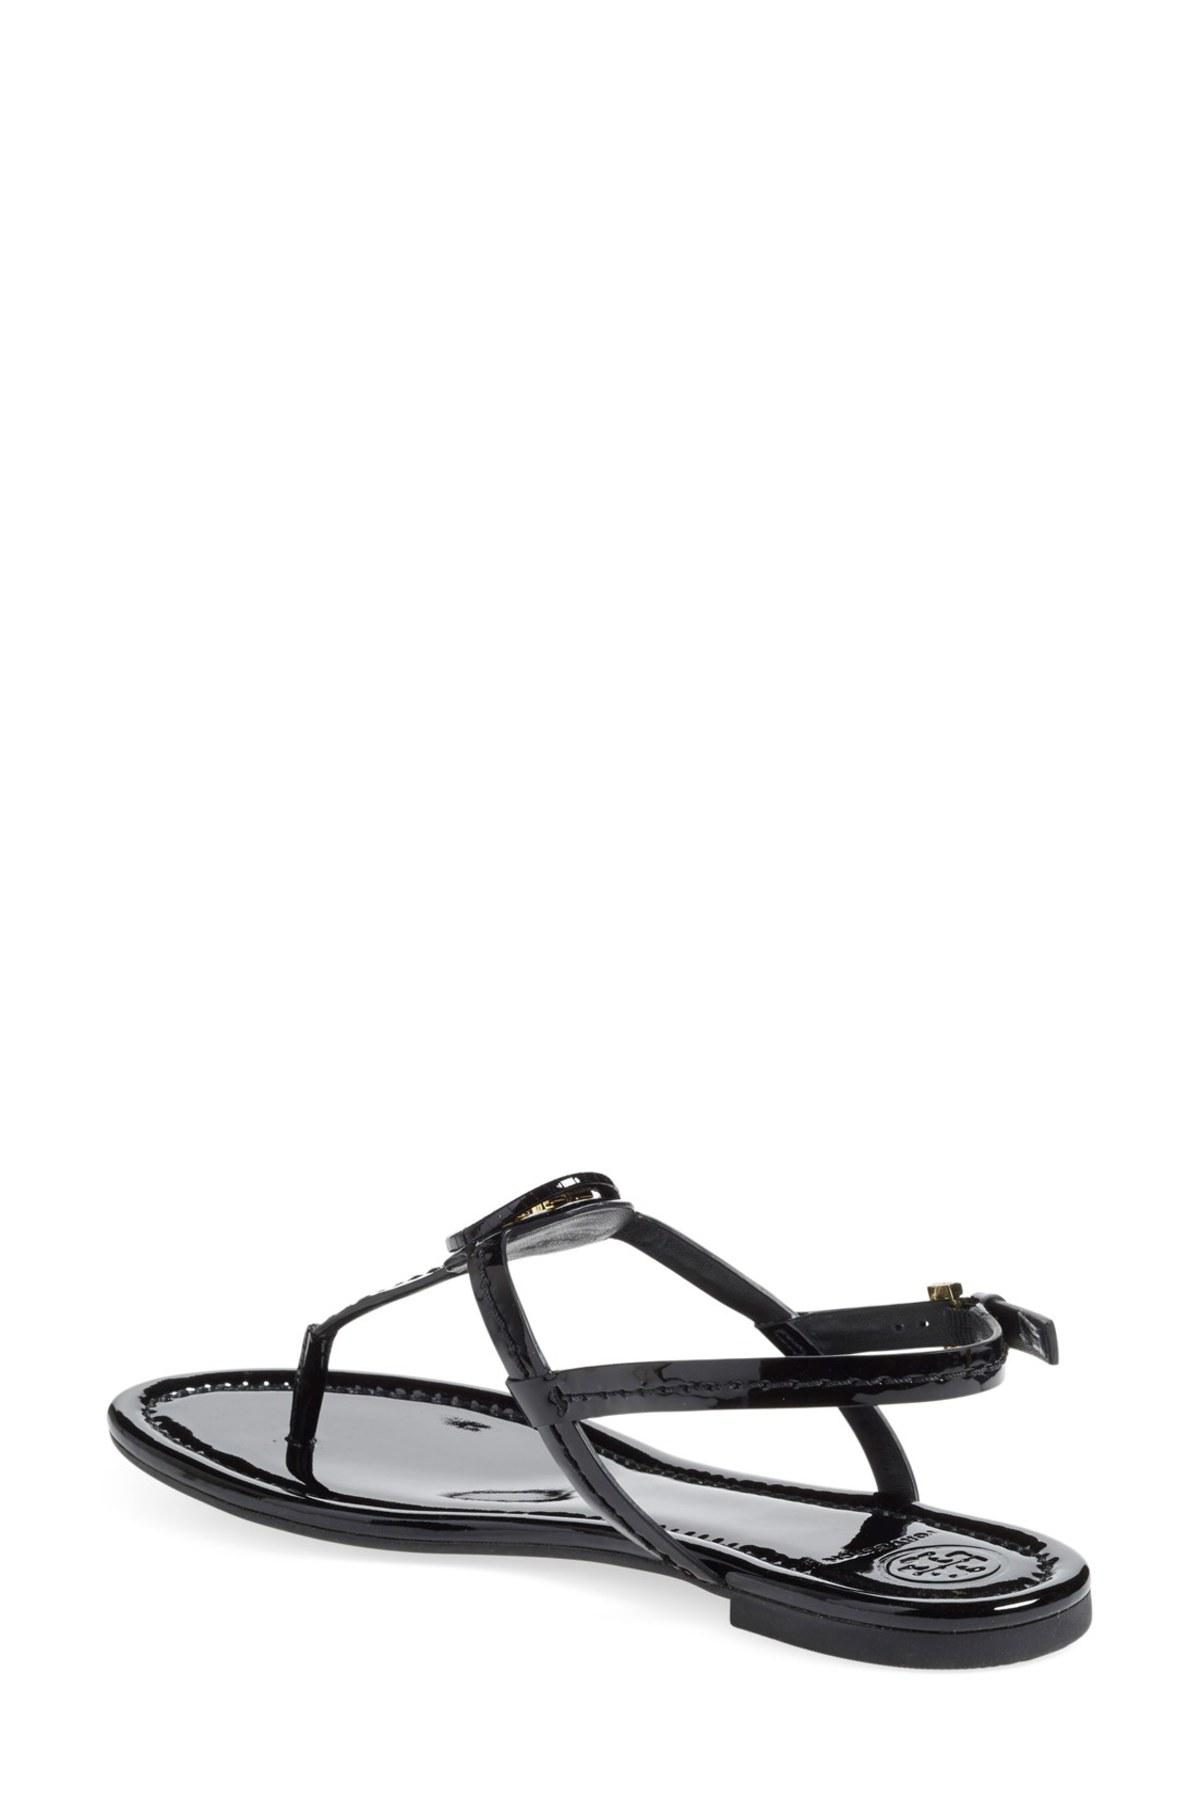 739926a20fd Lyst - Tory Burch Dillan Sandal in Black